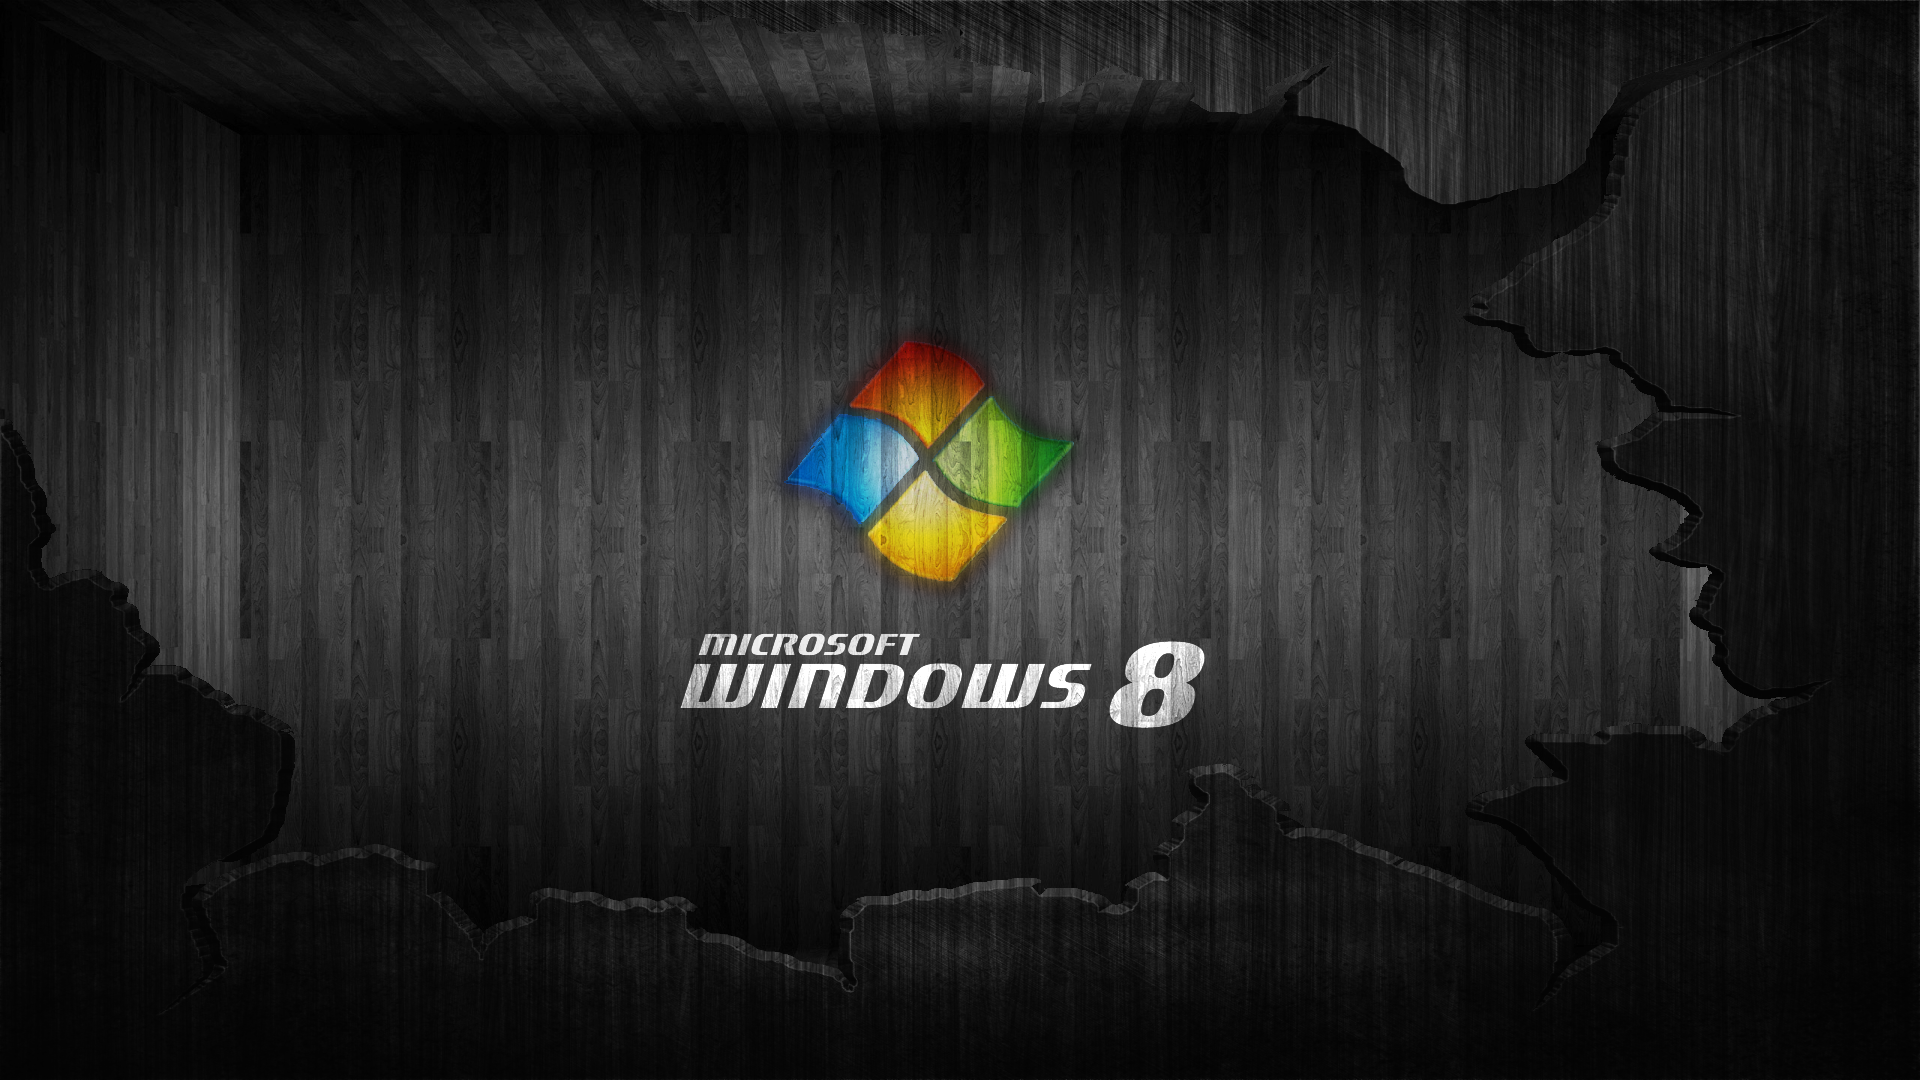 Download Windows 8 1080p HD Wallpaper 2026 Full Size 1920x1080